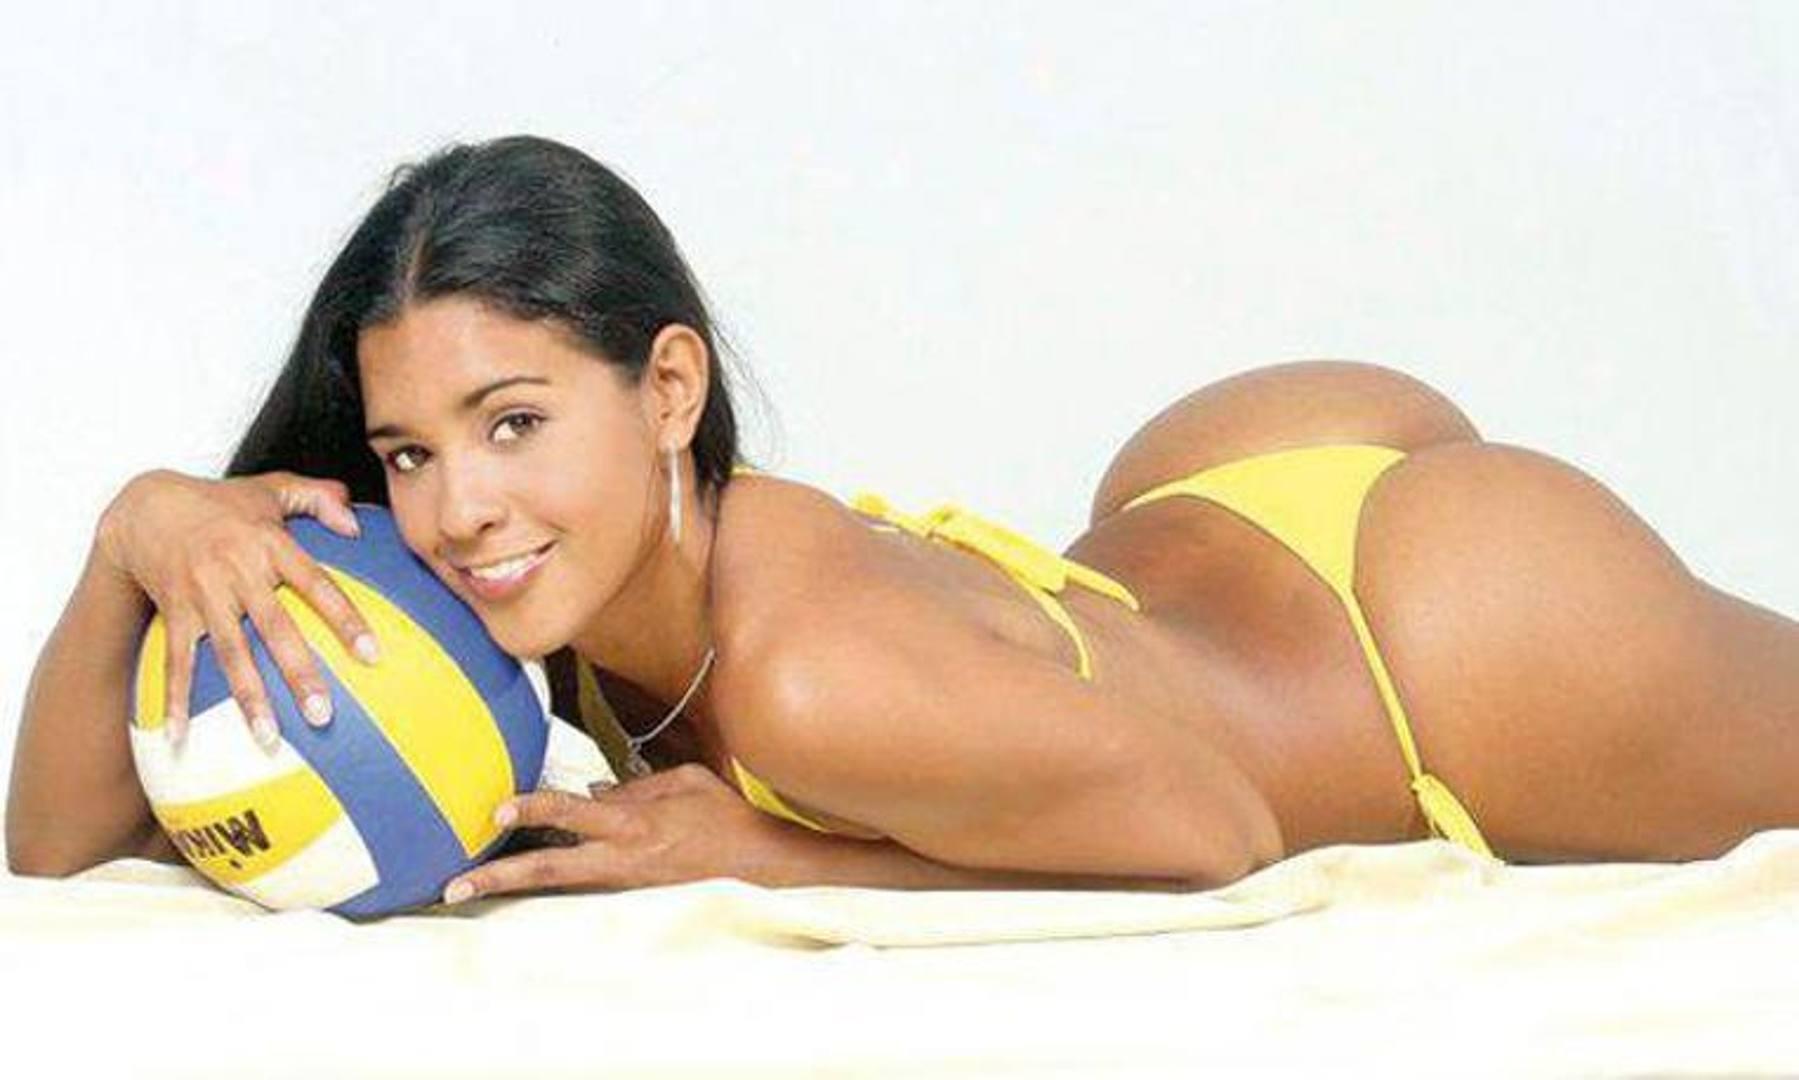 brazil-sex-athletic-girls